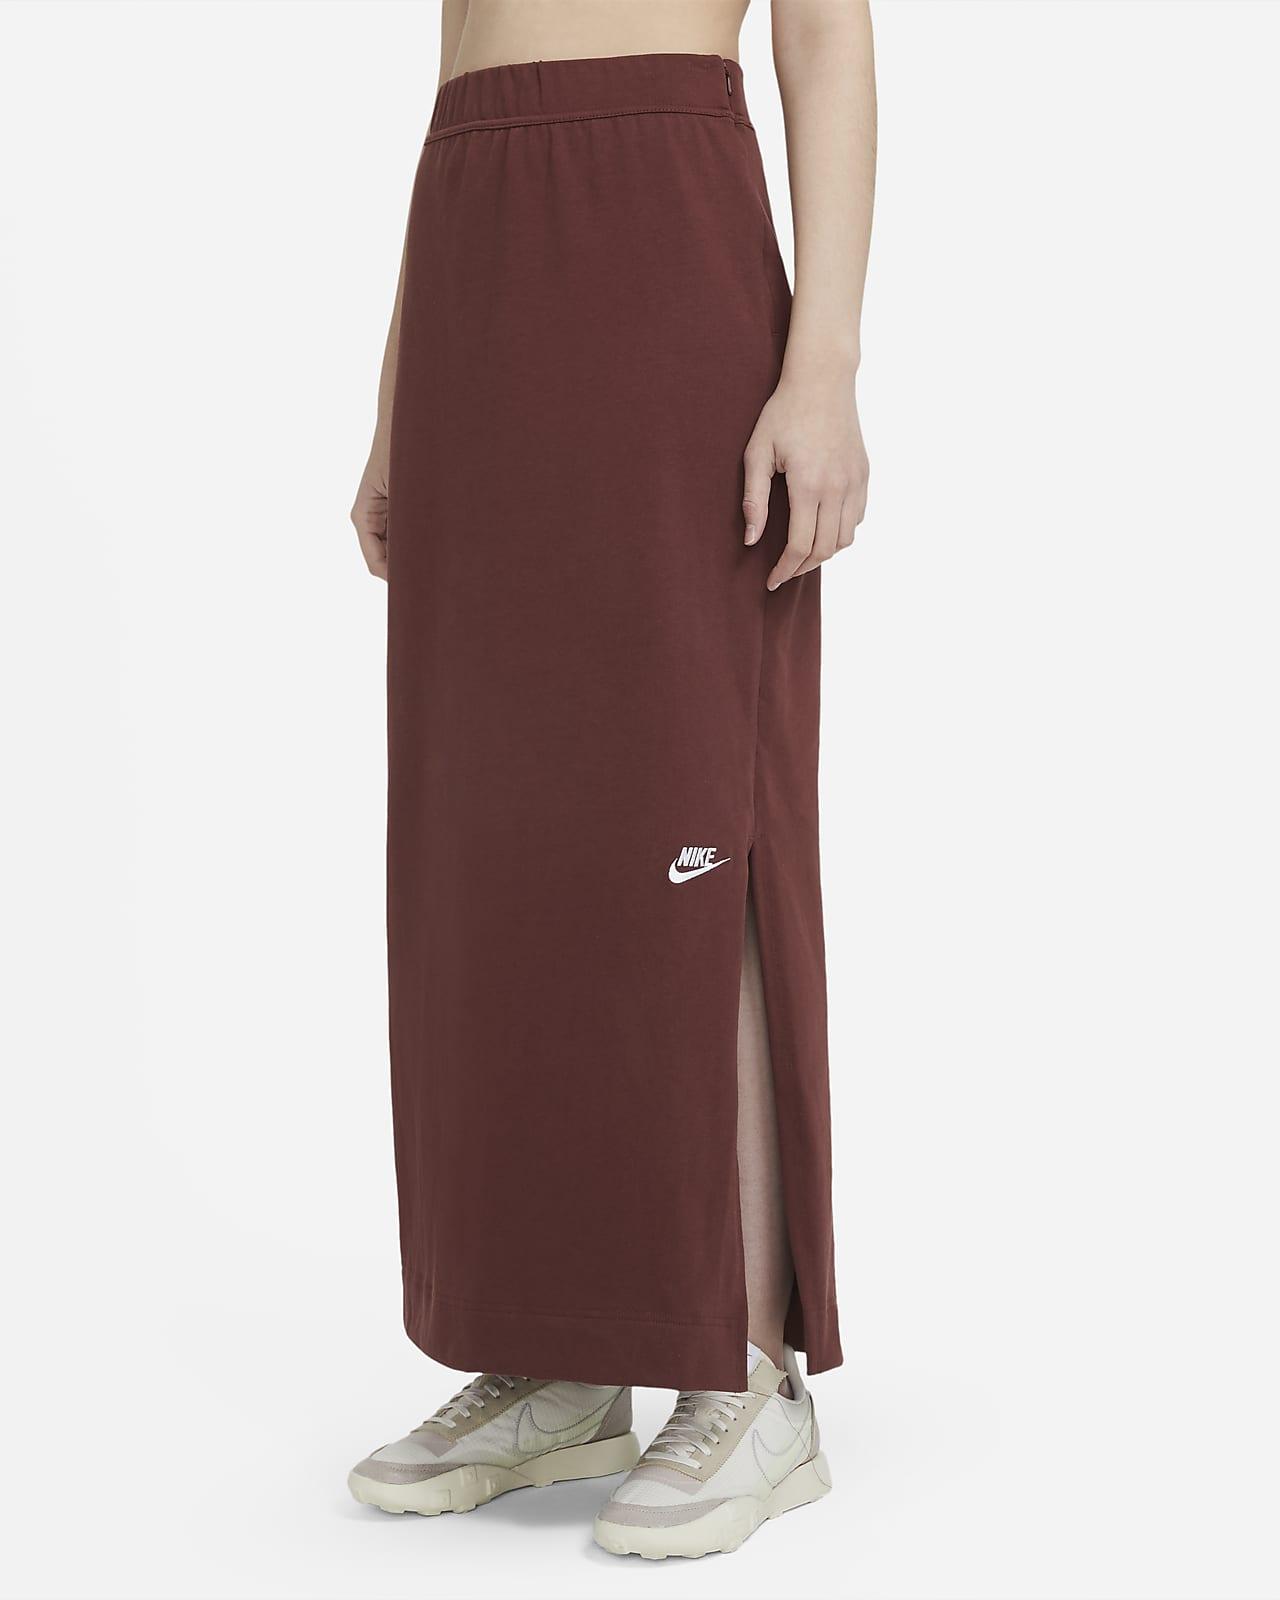 Falda para mujer Nike Sportswear